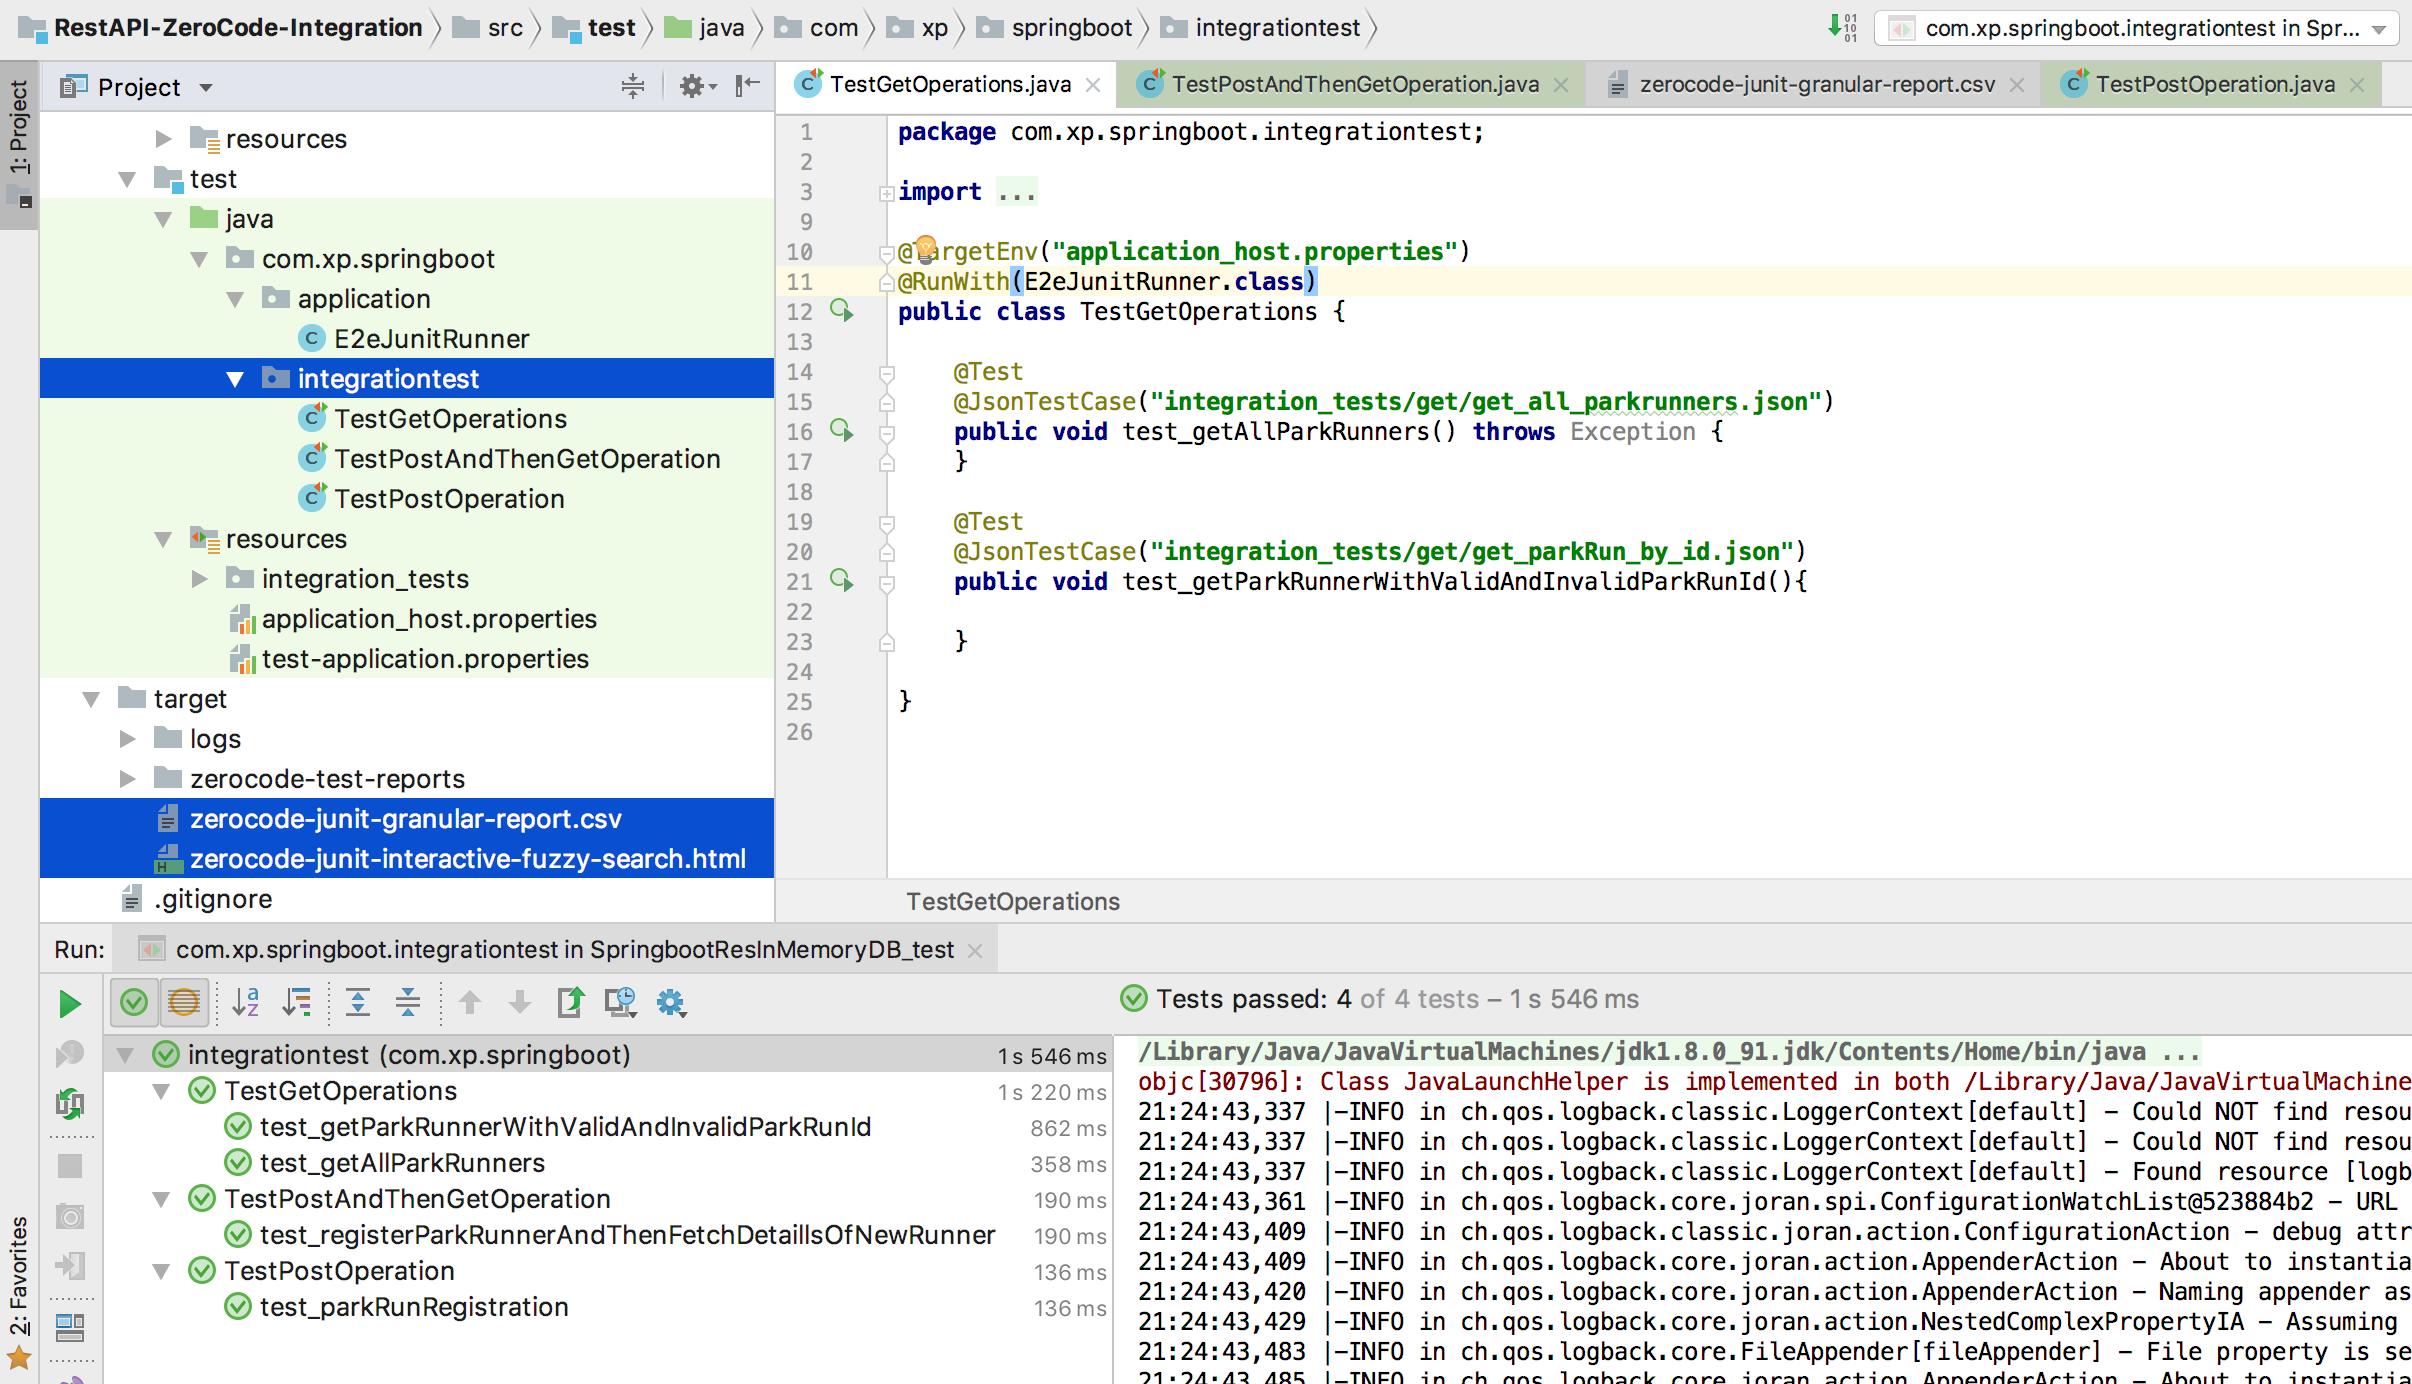 Spring boot + spring Data + h2 in-memory DB = hibernate error